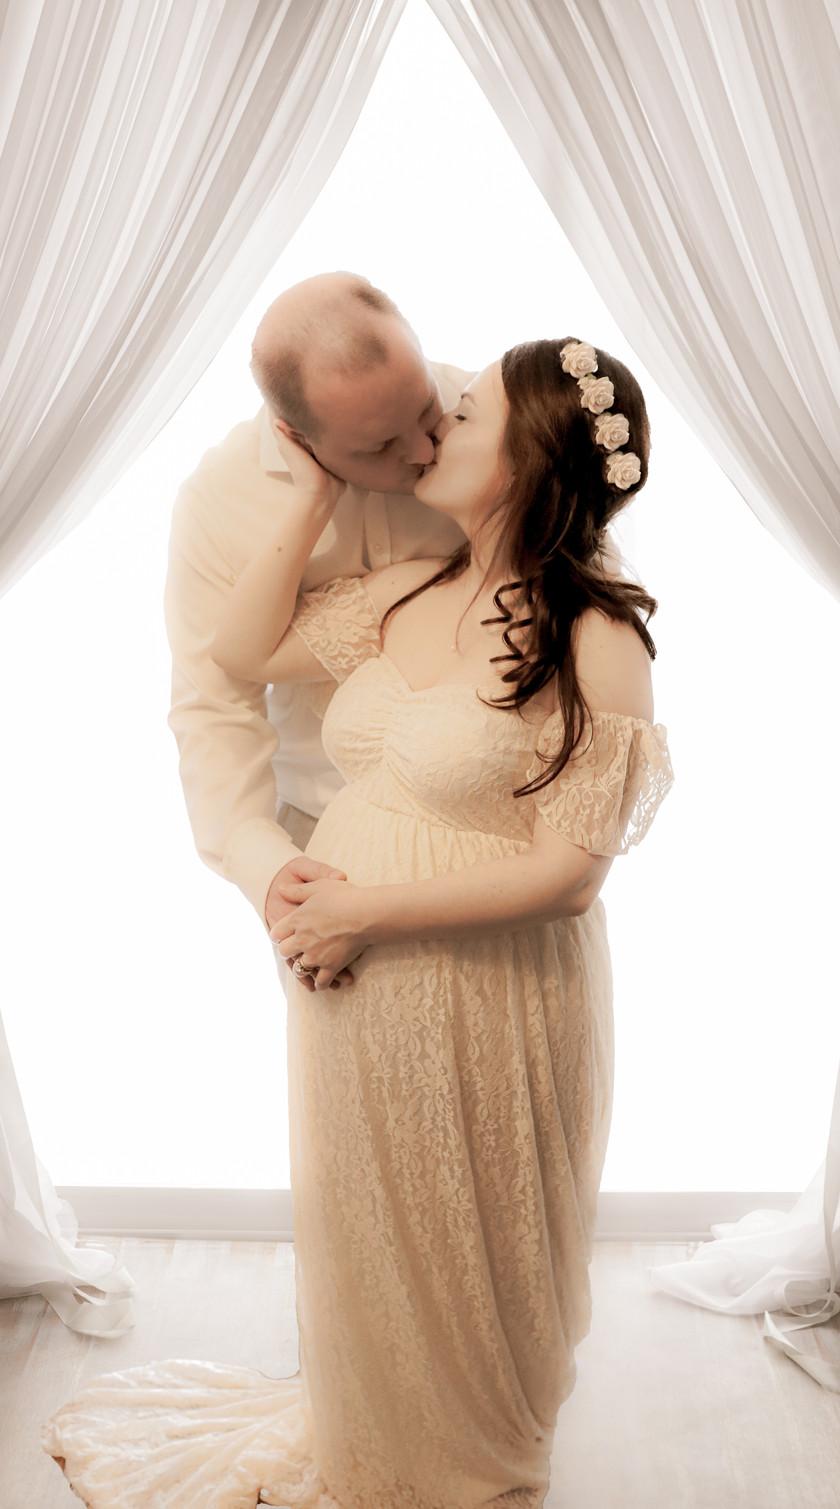 man and pregnant woman kissing